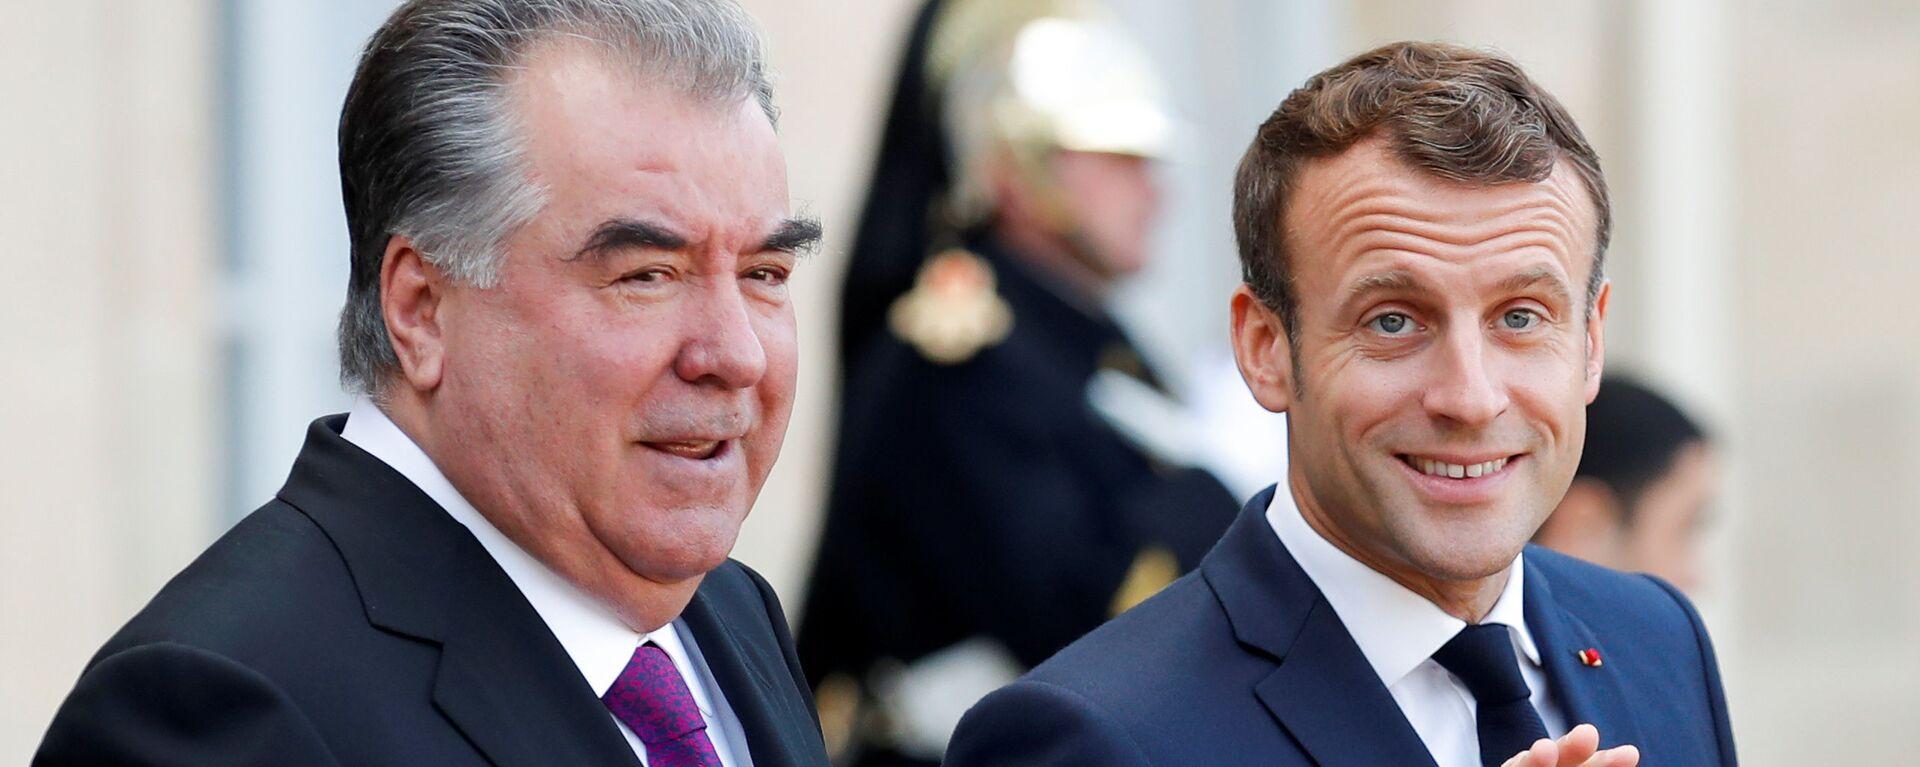 Президент Франции Эммануэль Макрон и президент Таджикистана Эмомали Рахмон - Sputnik Тоҷикистон, 1920, 11.10.2021